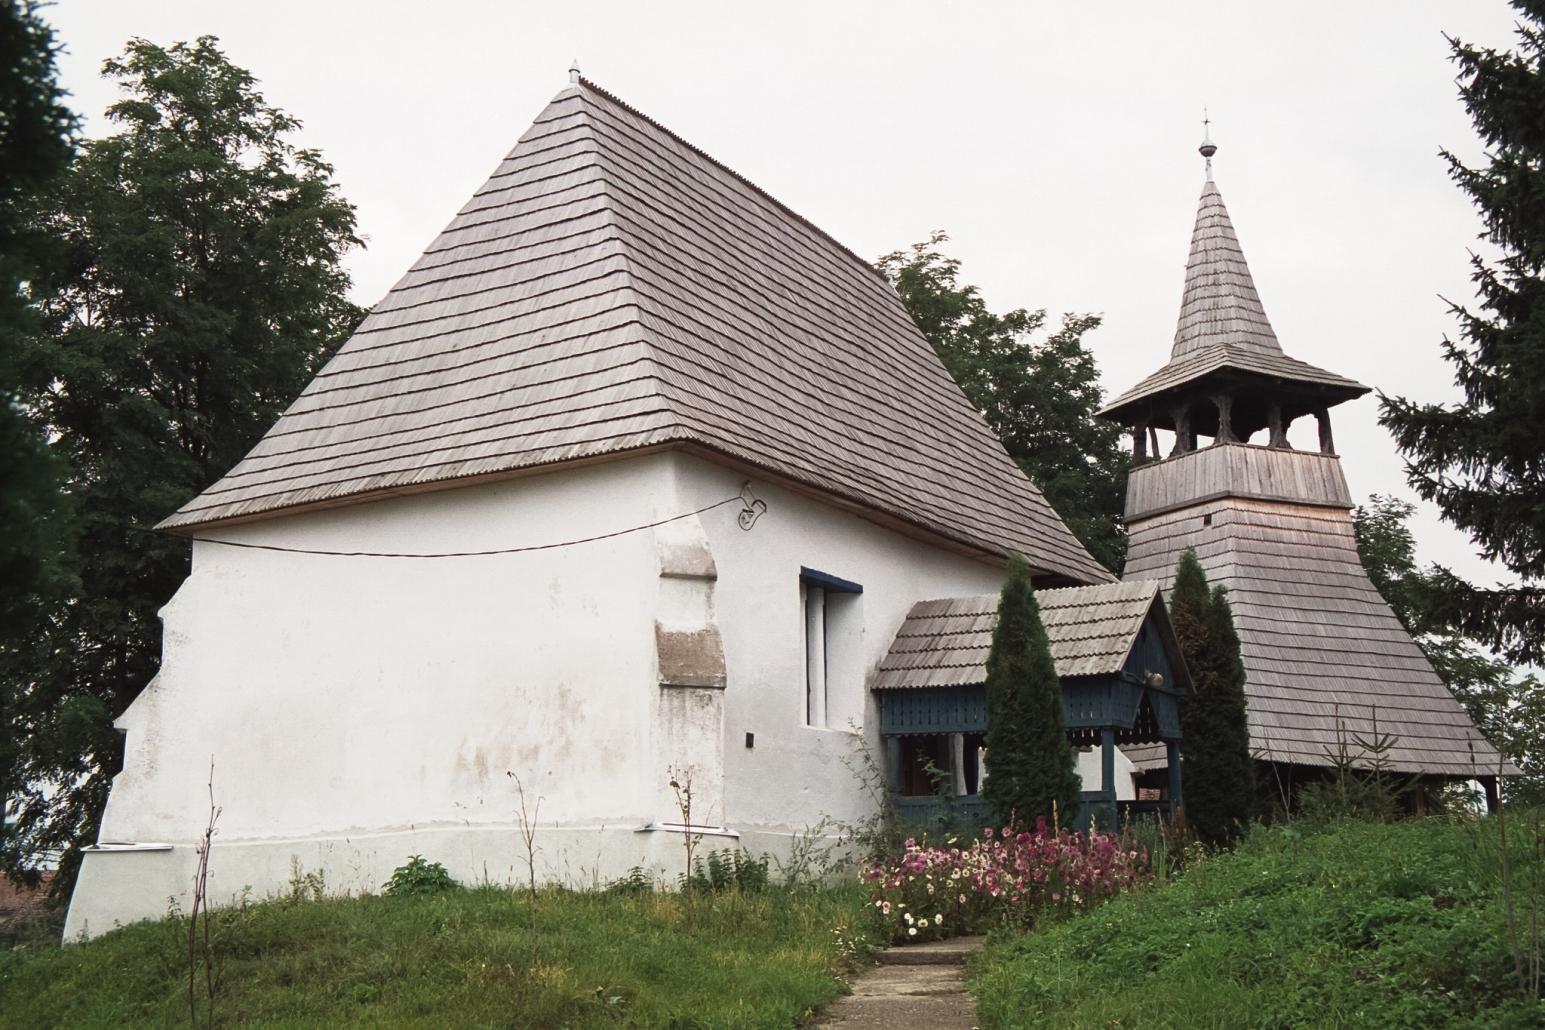 Biserică veche, Romania